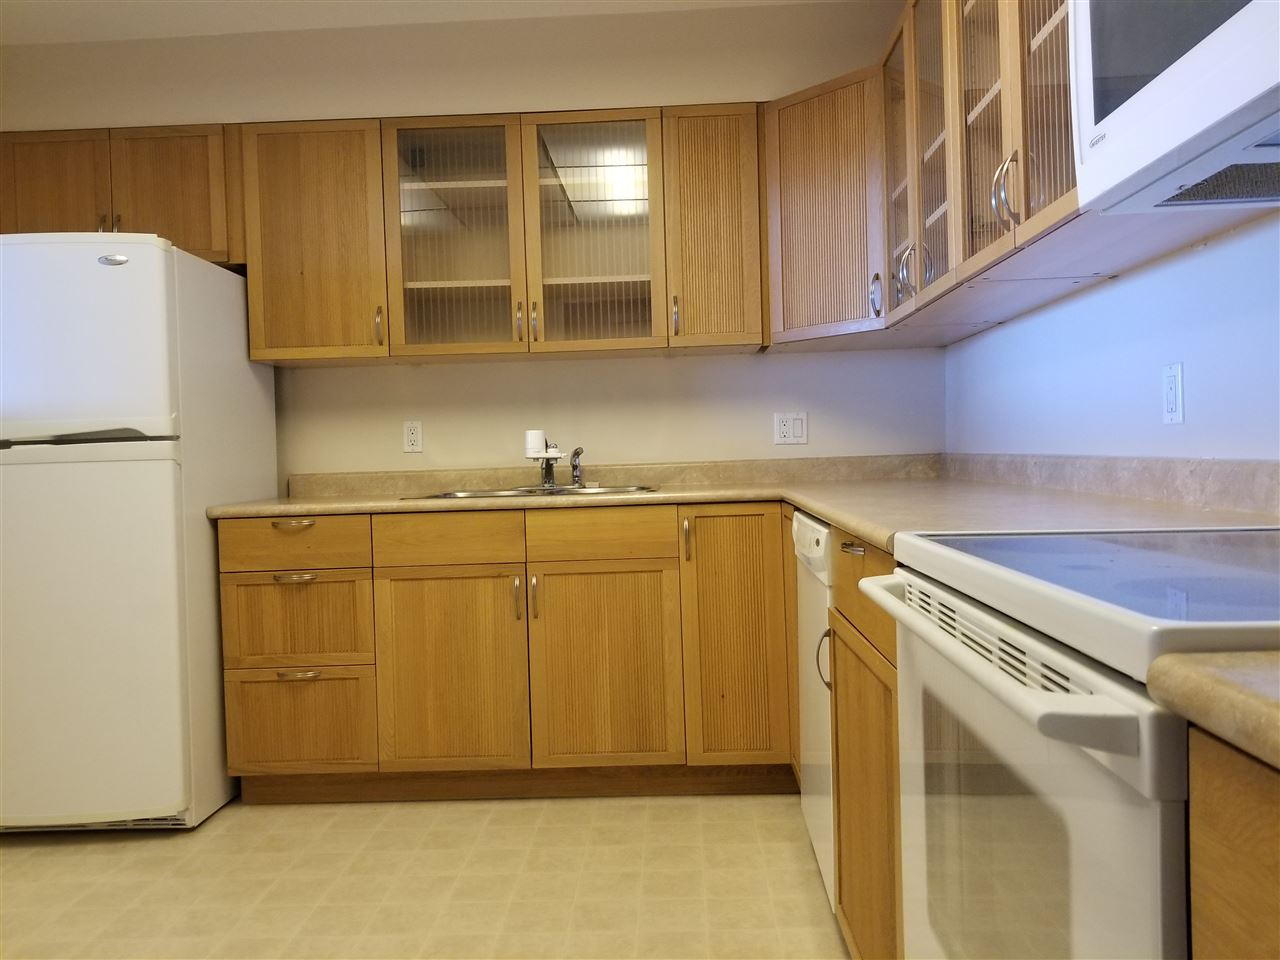 Condo Apartment at 707 1442 FOSTER STREET, Unit 707, South Surrey White Rock, British Columbia. Image 11